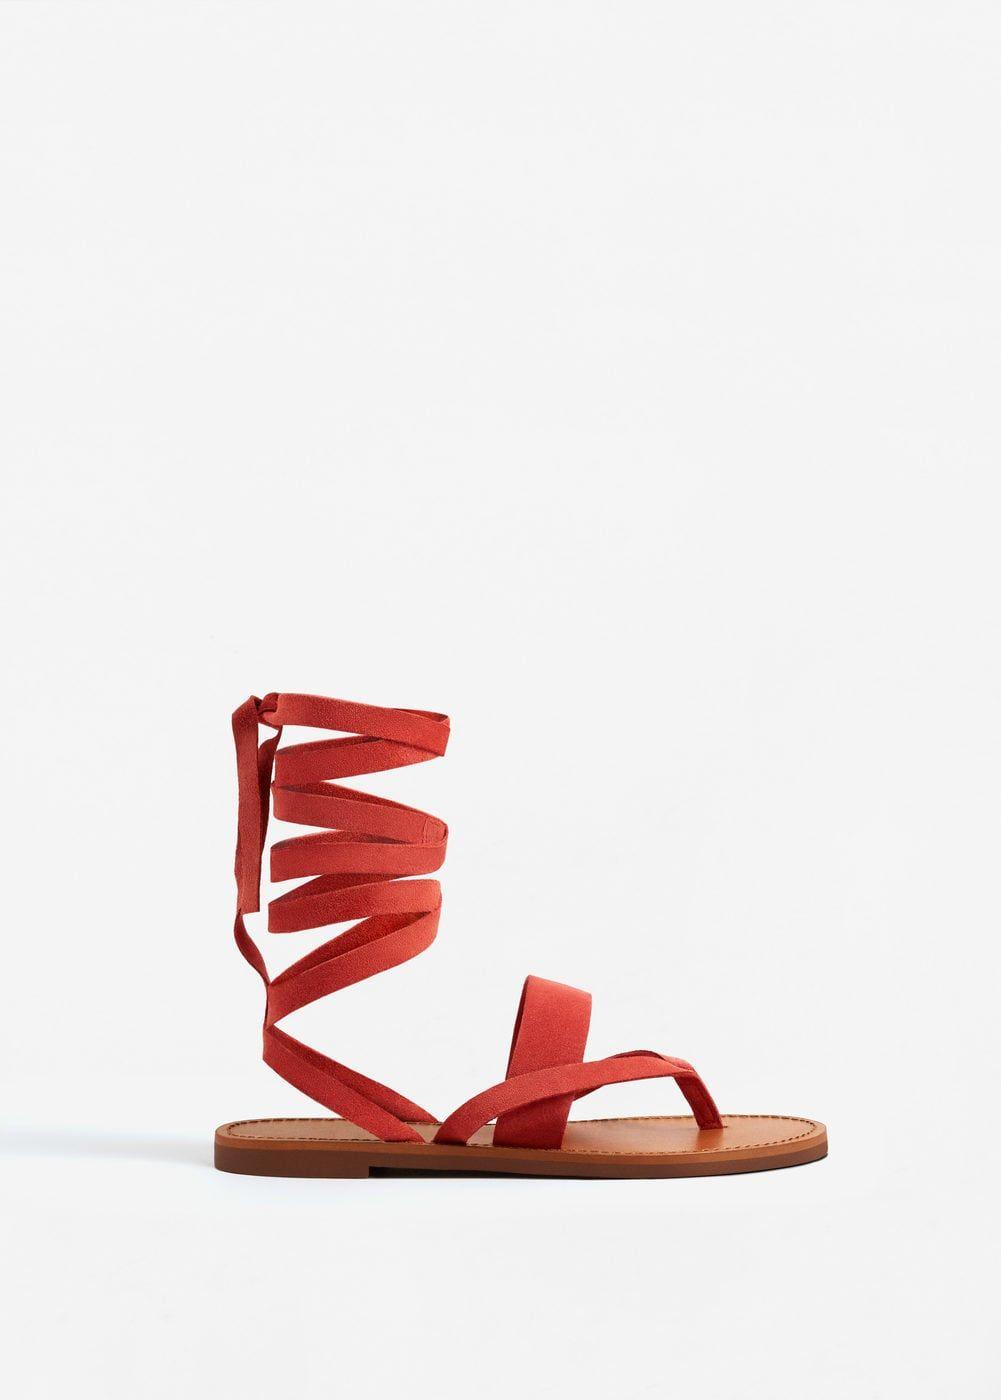 c2cc1fb06 Sandalia romana piel - Zapatos de Mujer